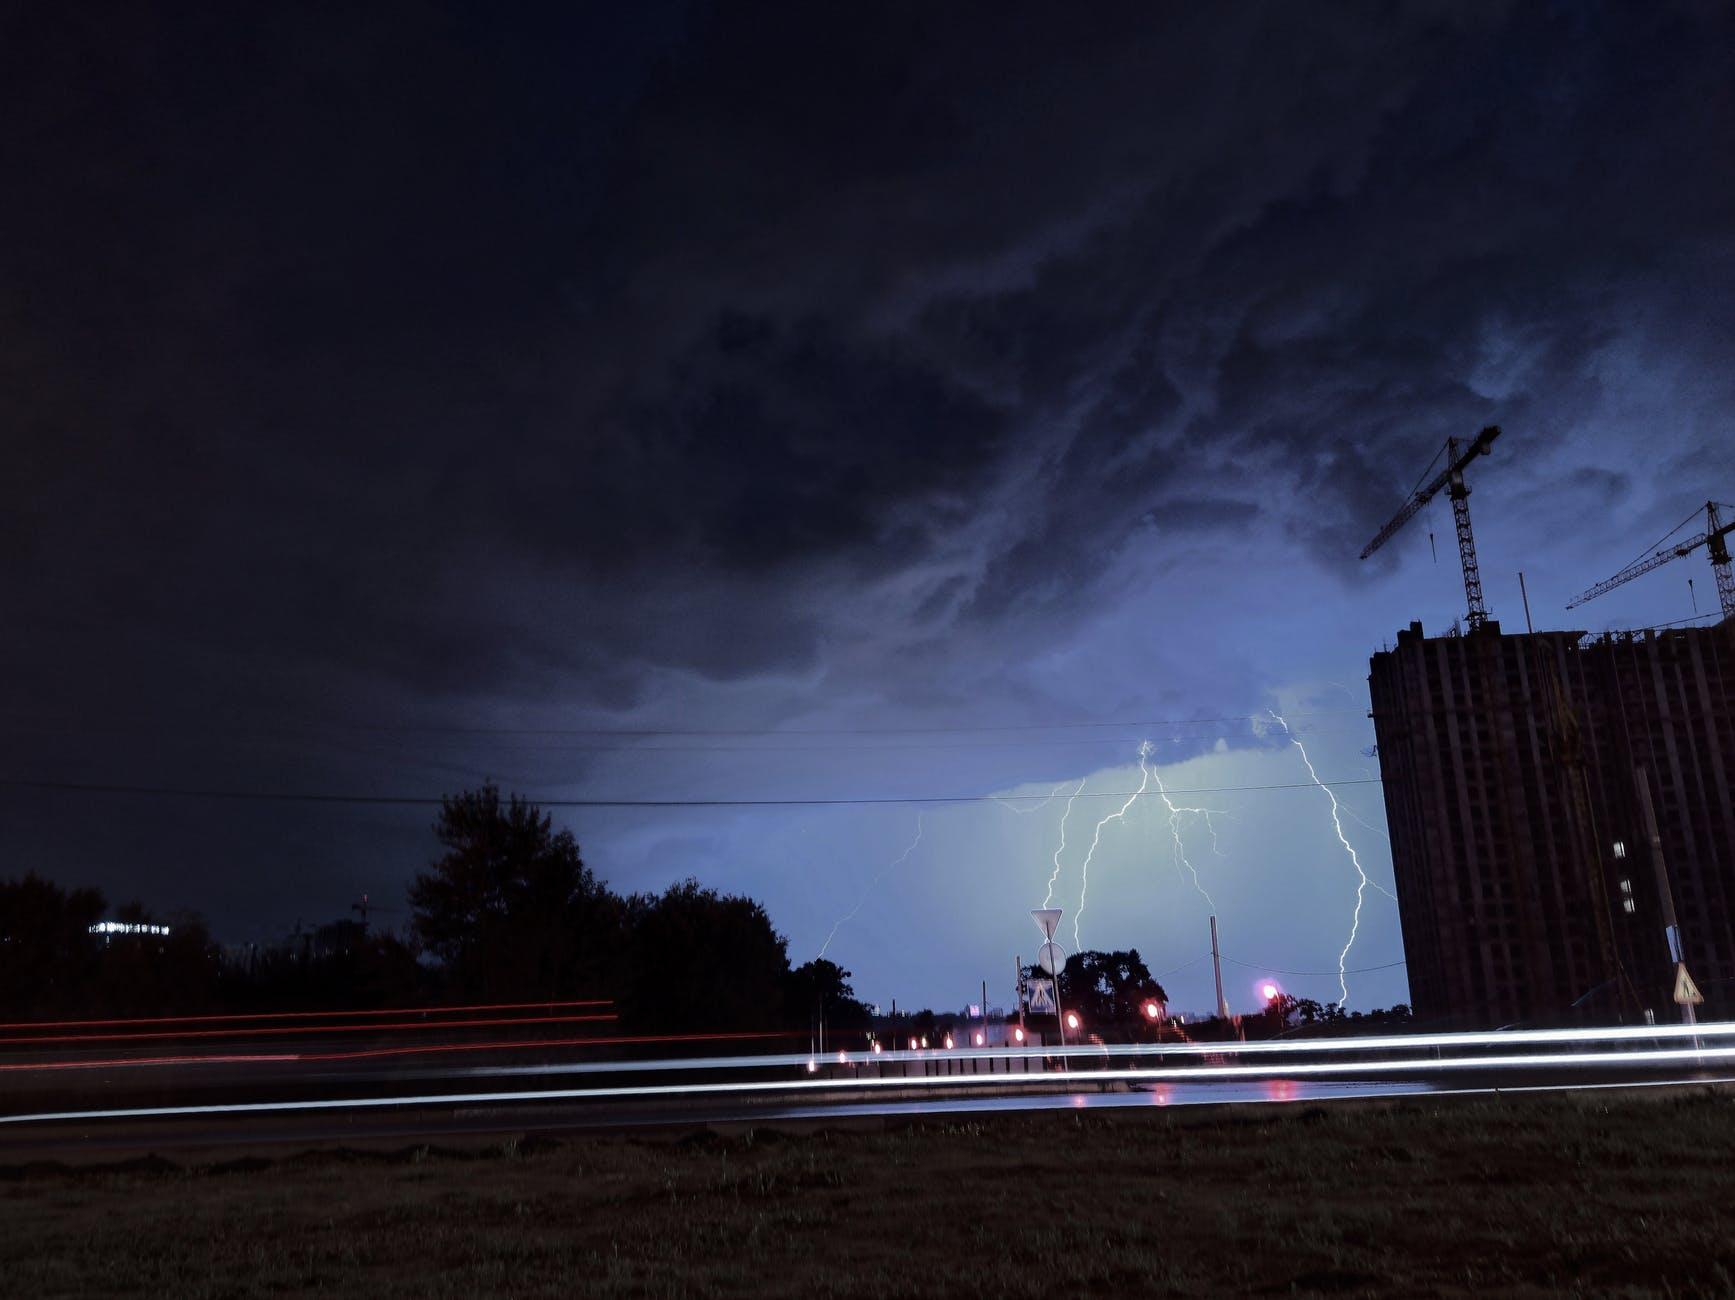 lightning strikes on ground